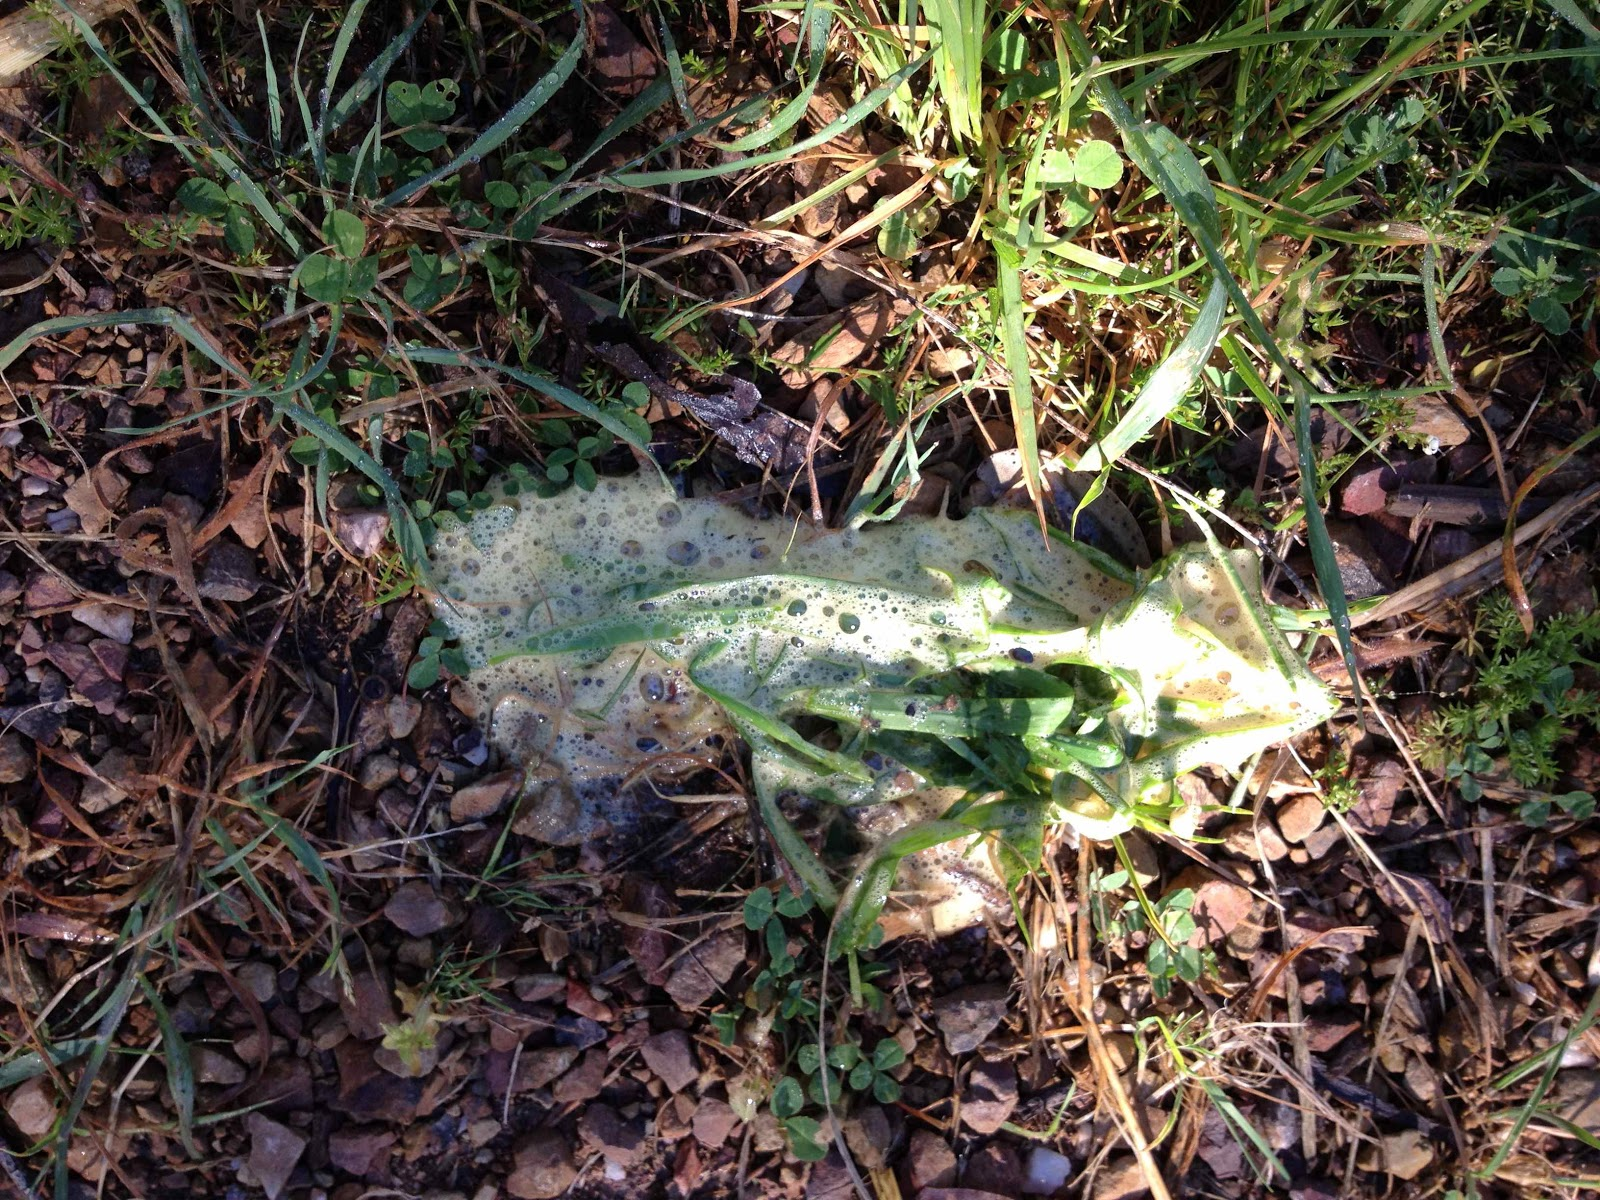 Dog Eating Grass Vomiting White Foam